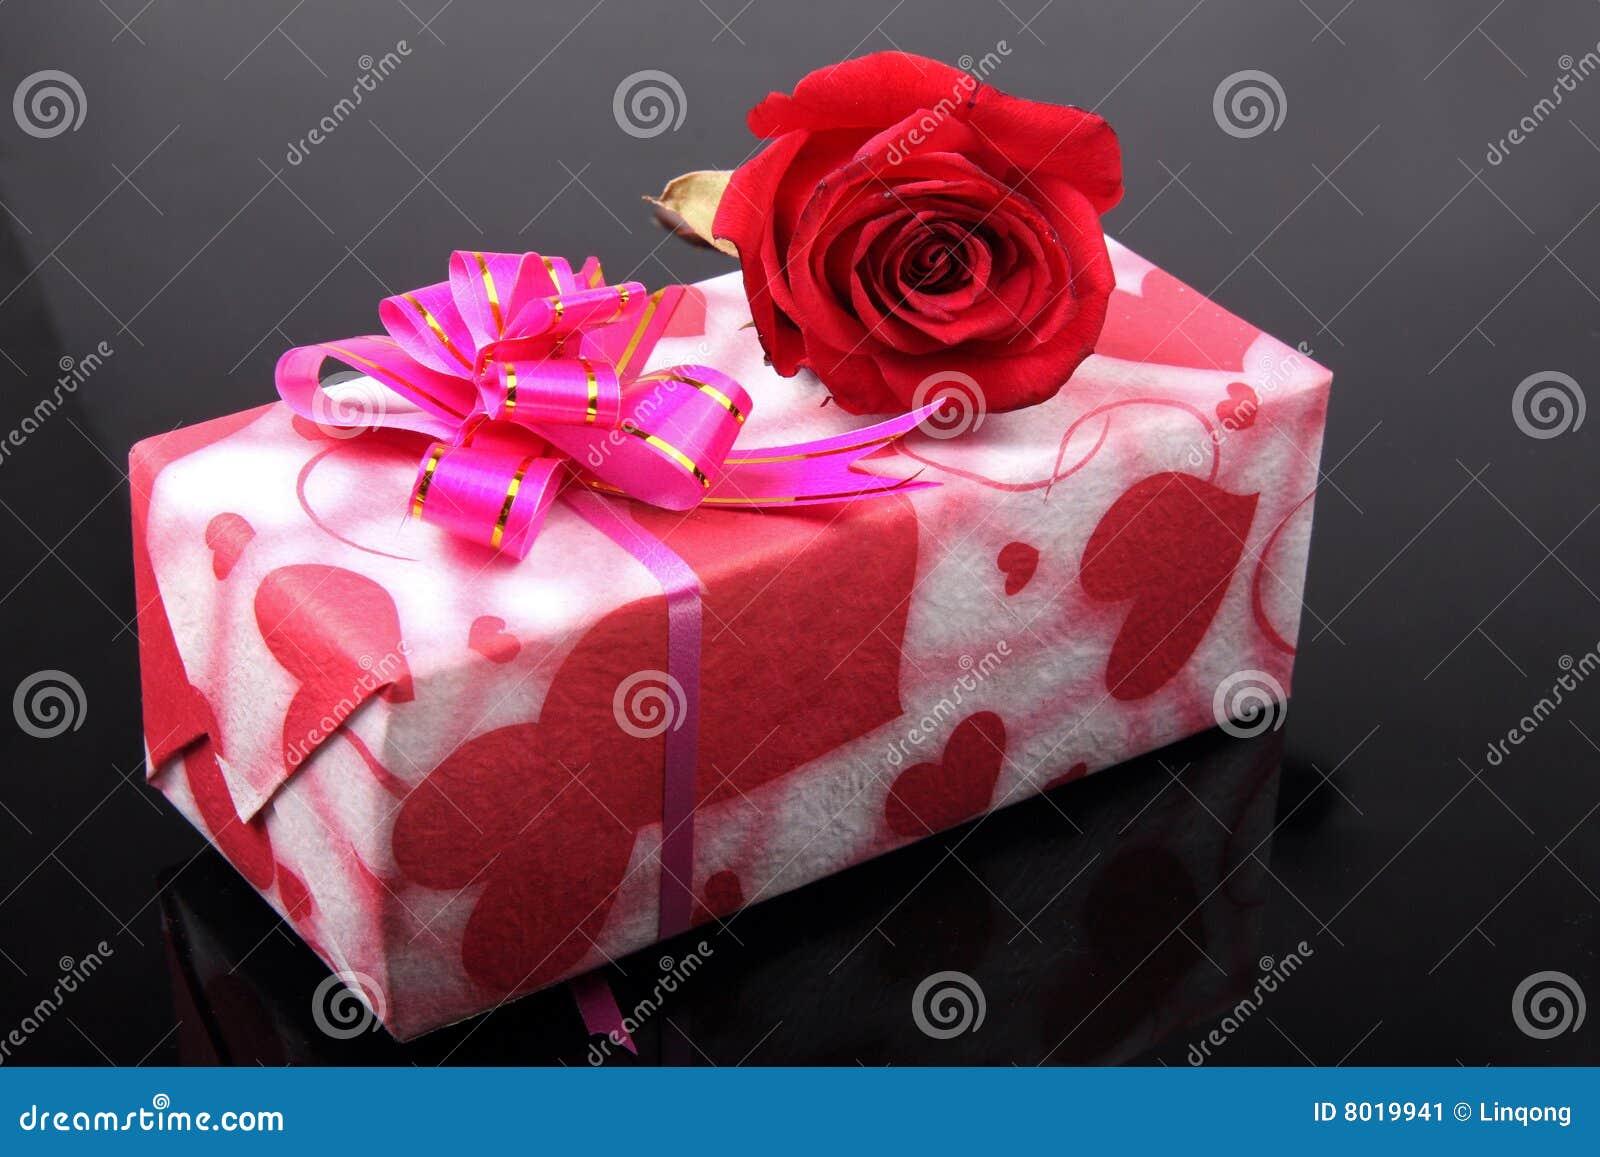 Beautiful gift box with rose stock image image of beautiful beautiful gift box with rose negle Images